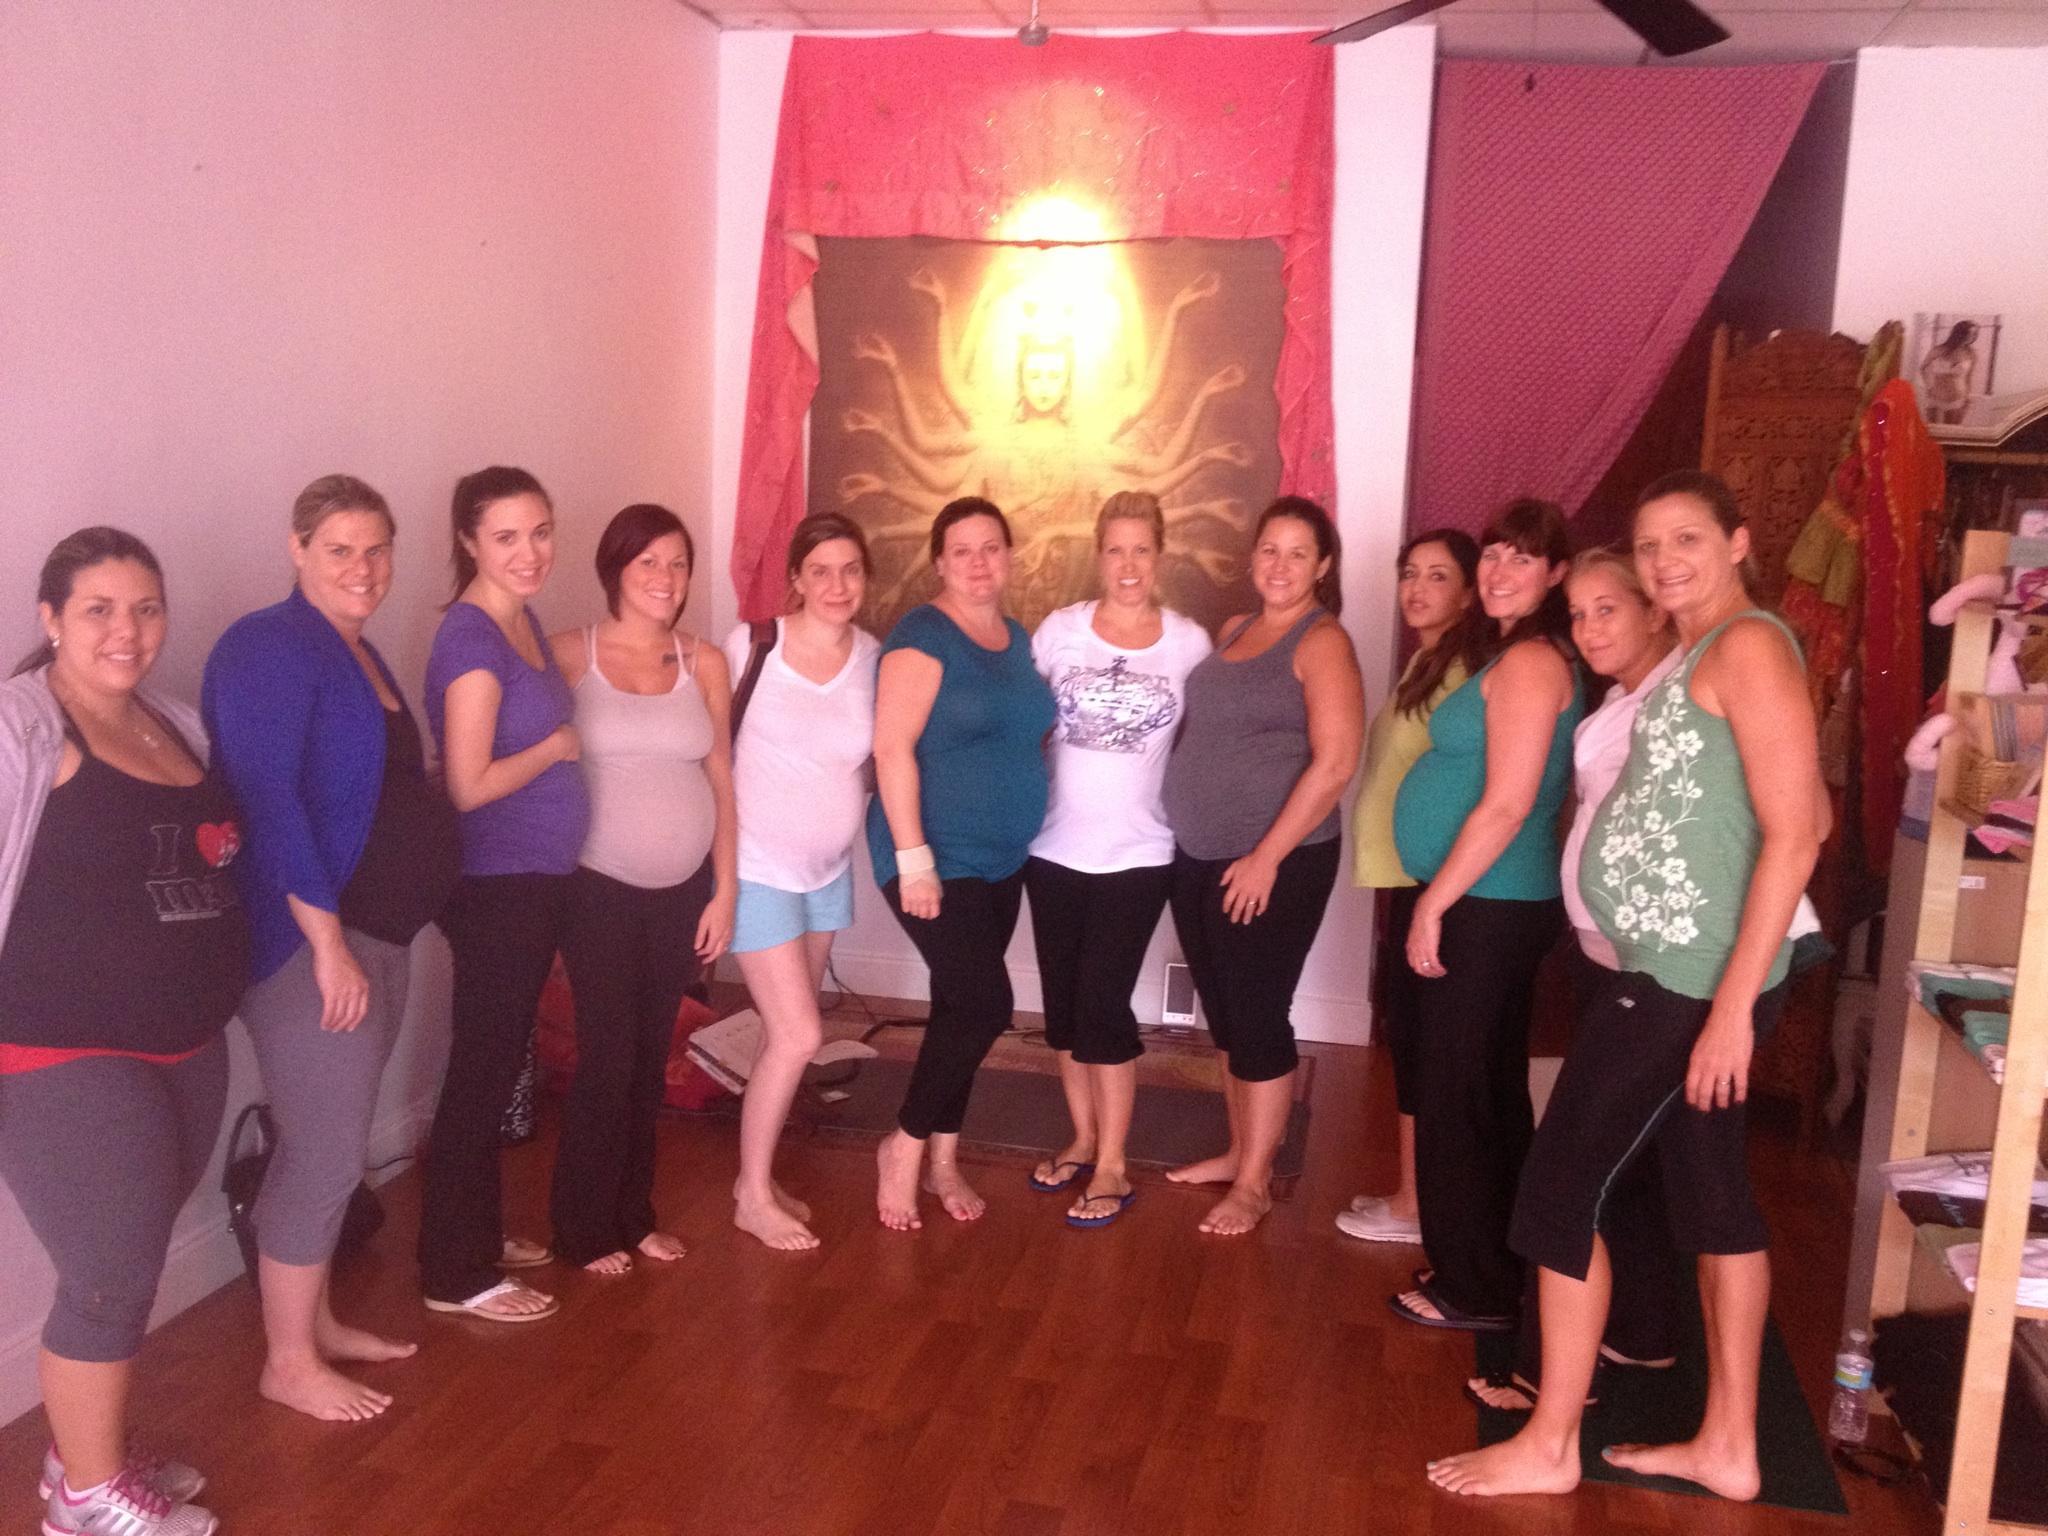 prenatal yoga community at The Red Tent